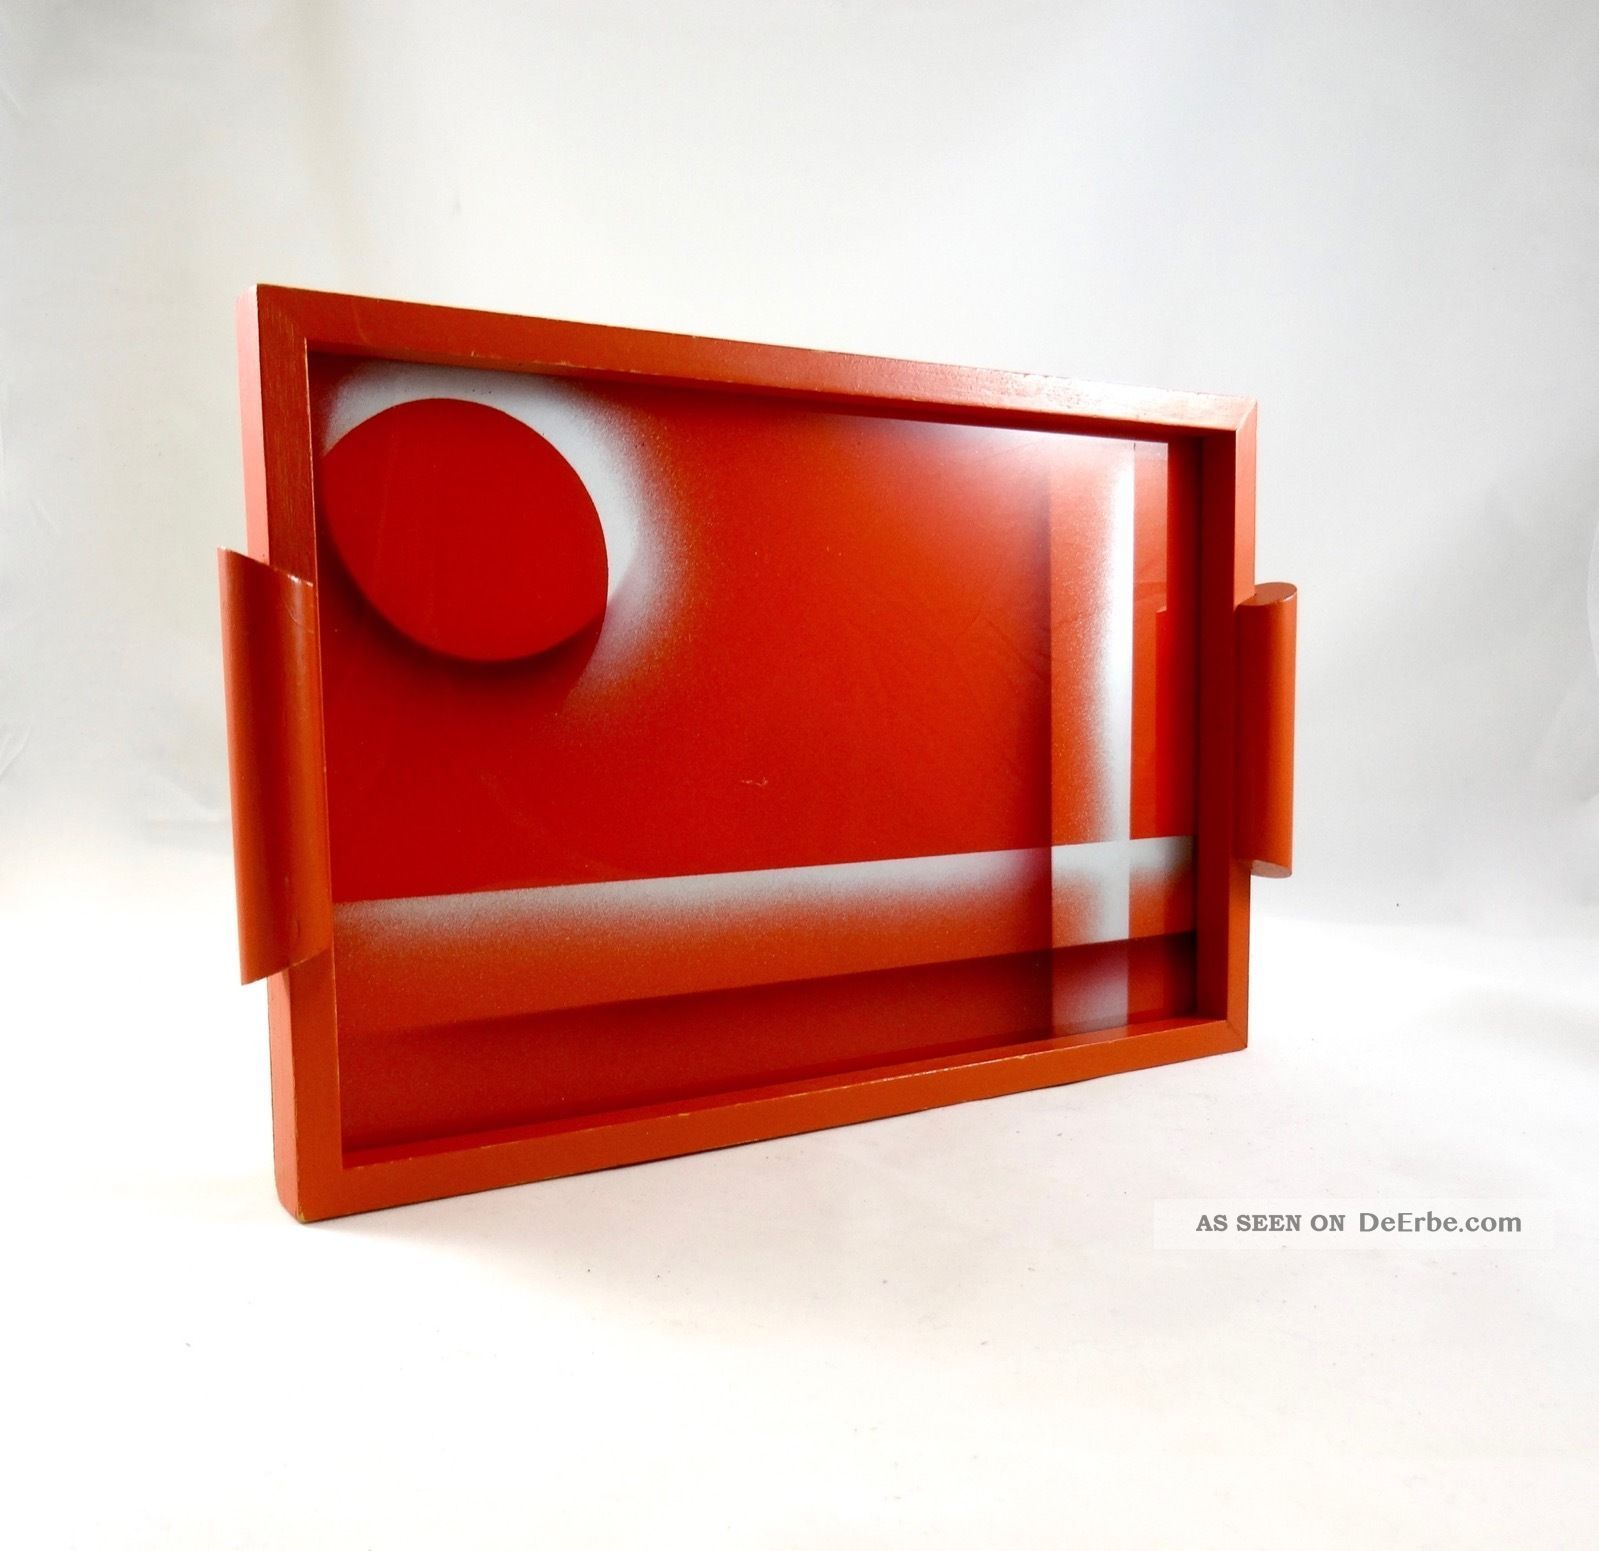 Avantgarde Suprematismus Bauhaus Tablett Geometrisch Art Deco El Lissitzky Tray 1920-1949, Art Déco Bild